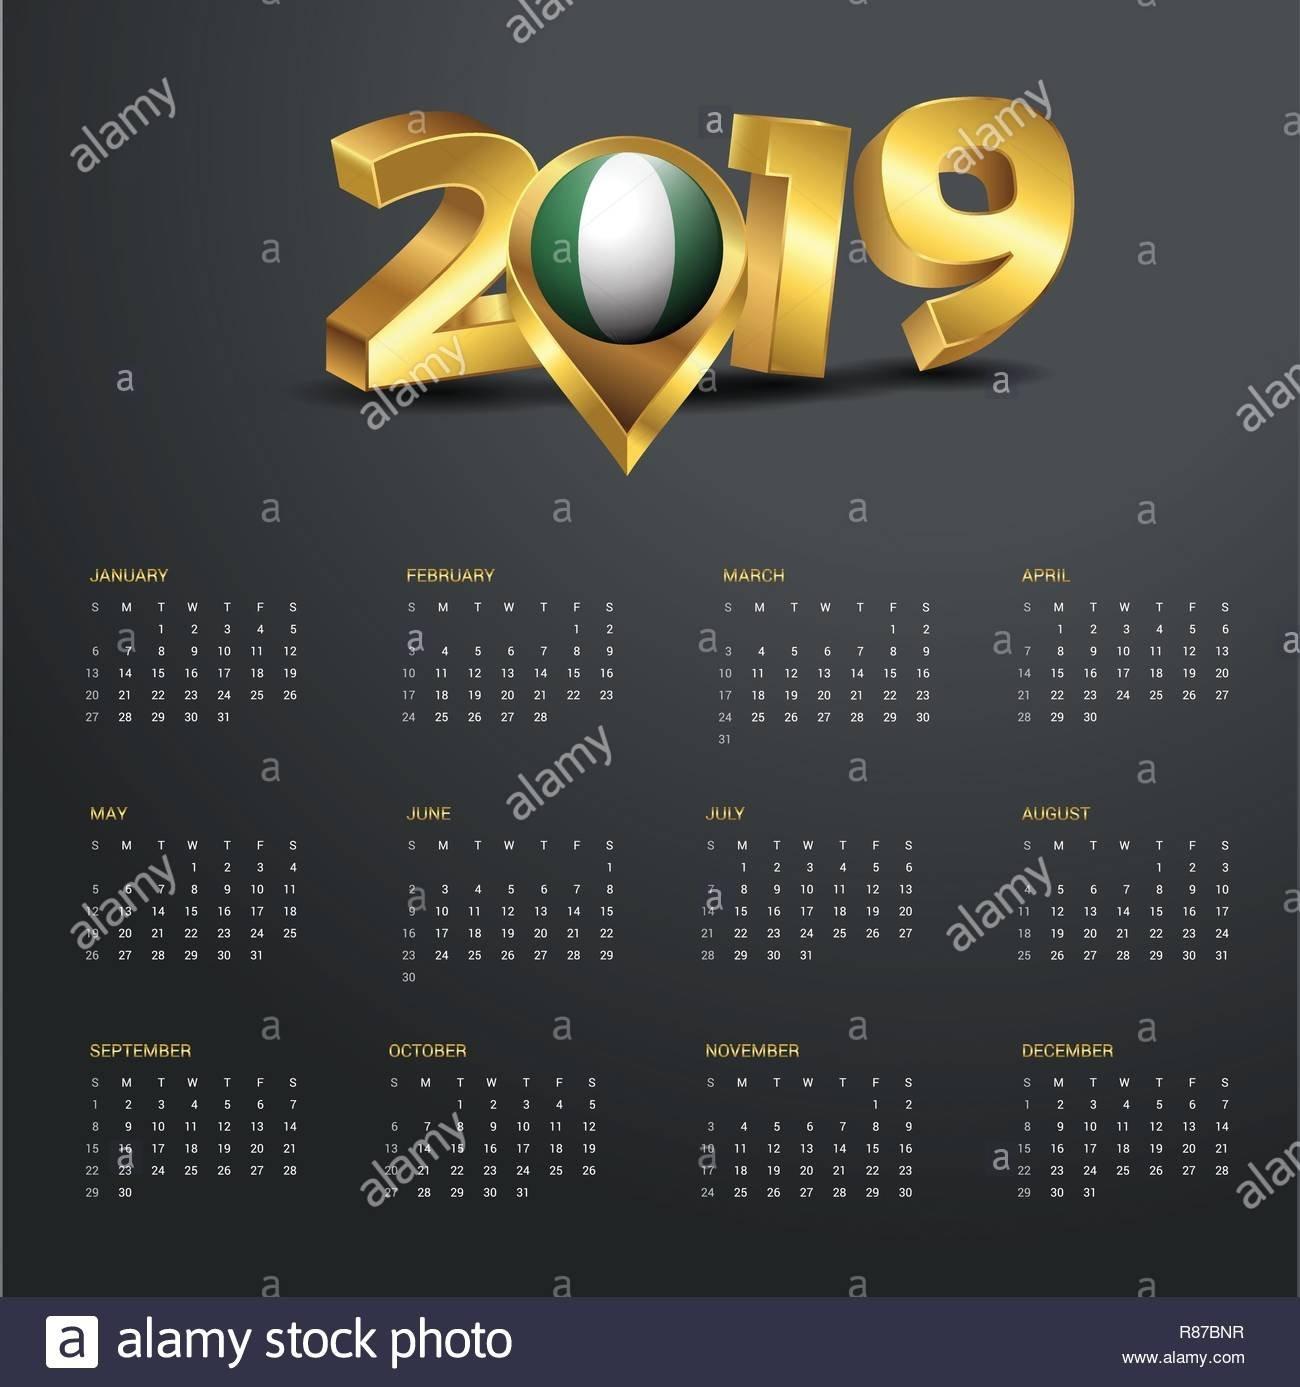 2019 Calendar Template. Nigeria Country Map Golden Typography Header Calendar 2019 Nigeria